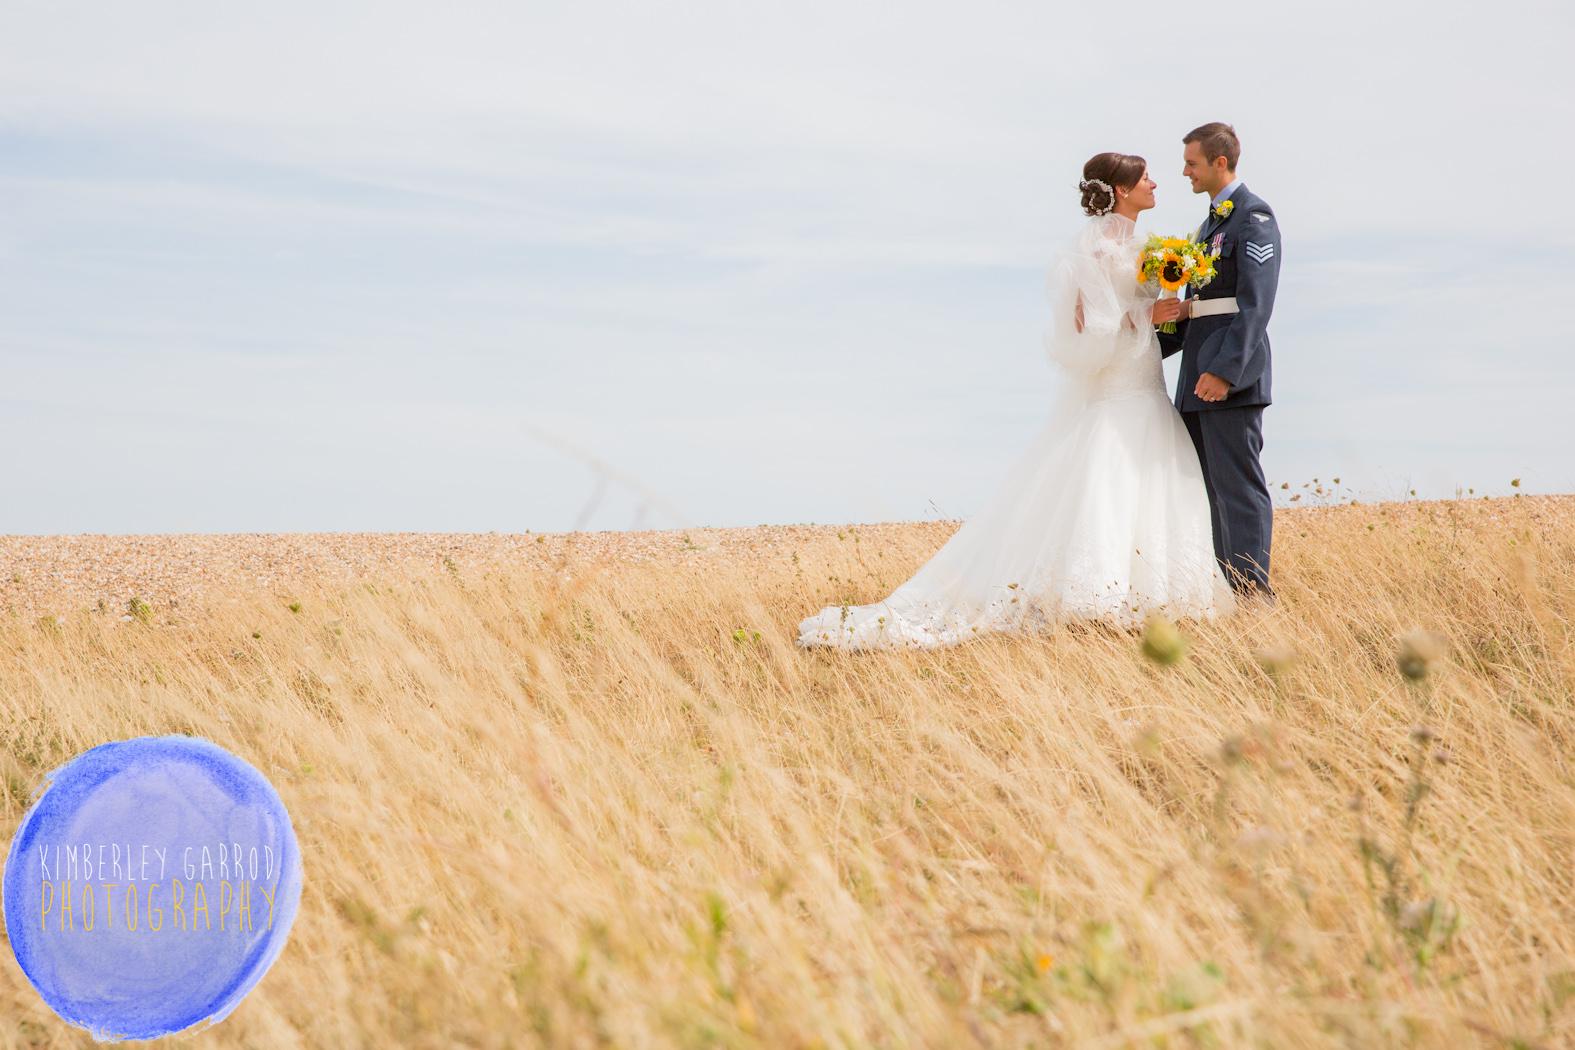 Royal Marines Museum Southsea Wedding Photographer Kimberley Garrod-19